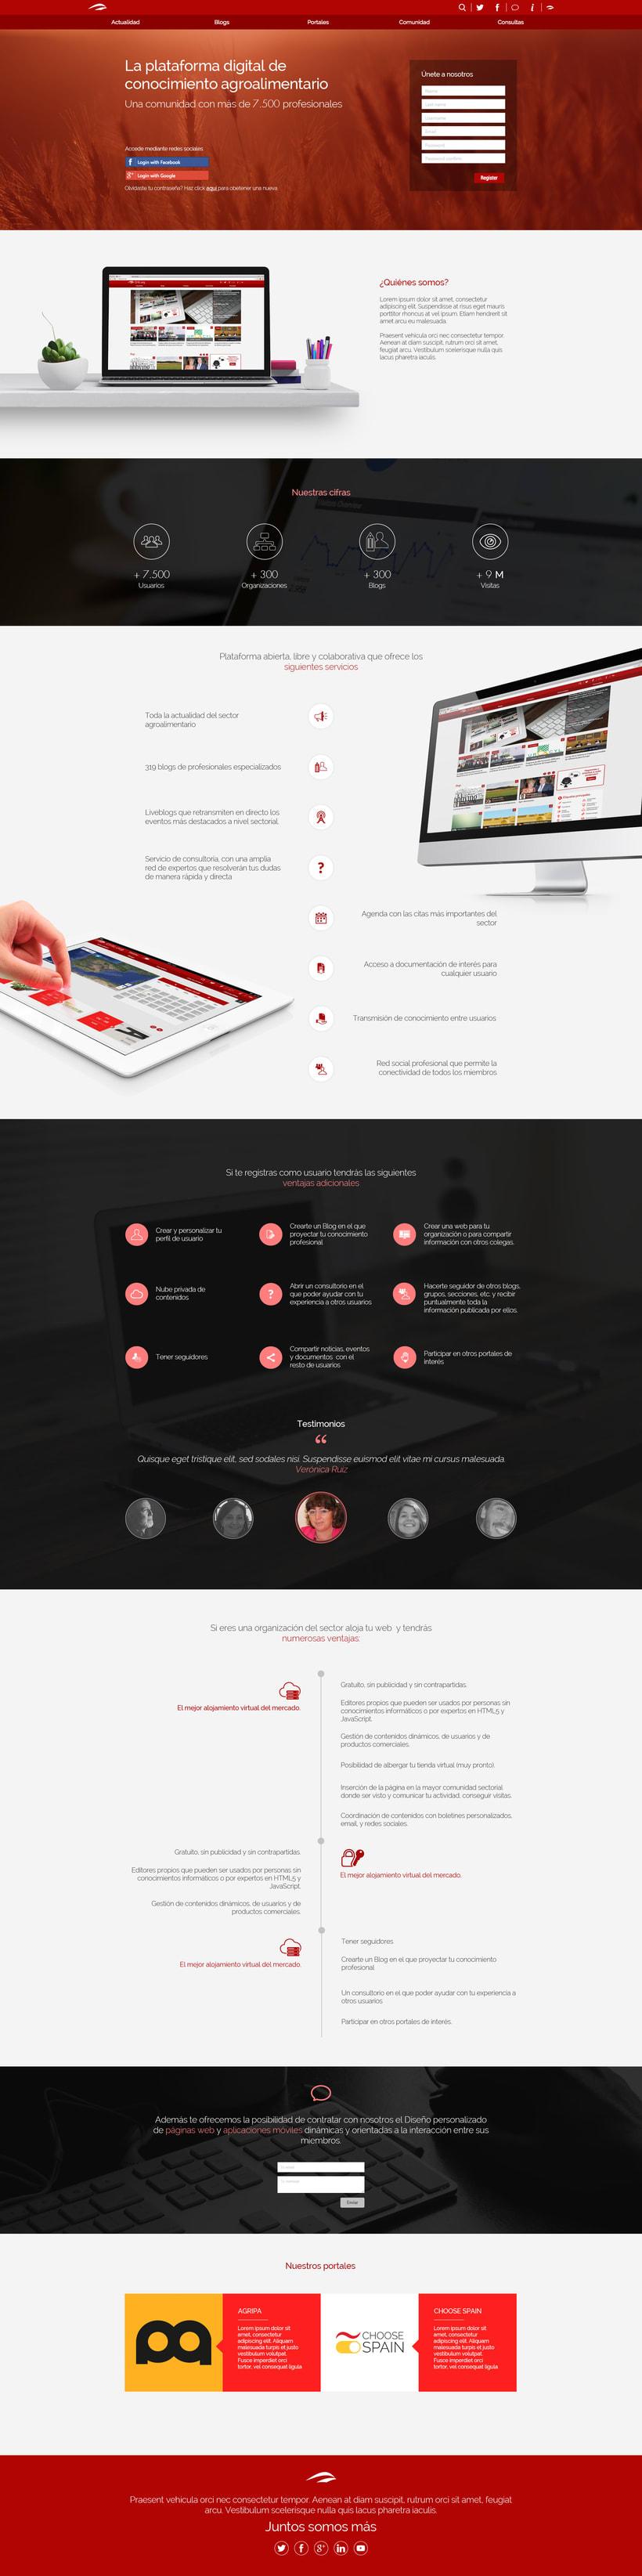 Landing Page Digital Platform -1